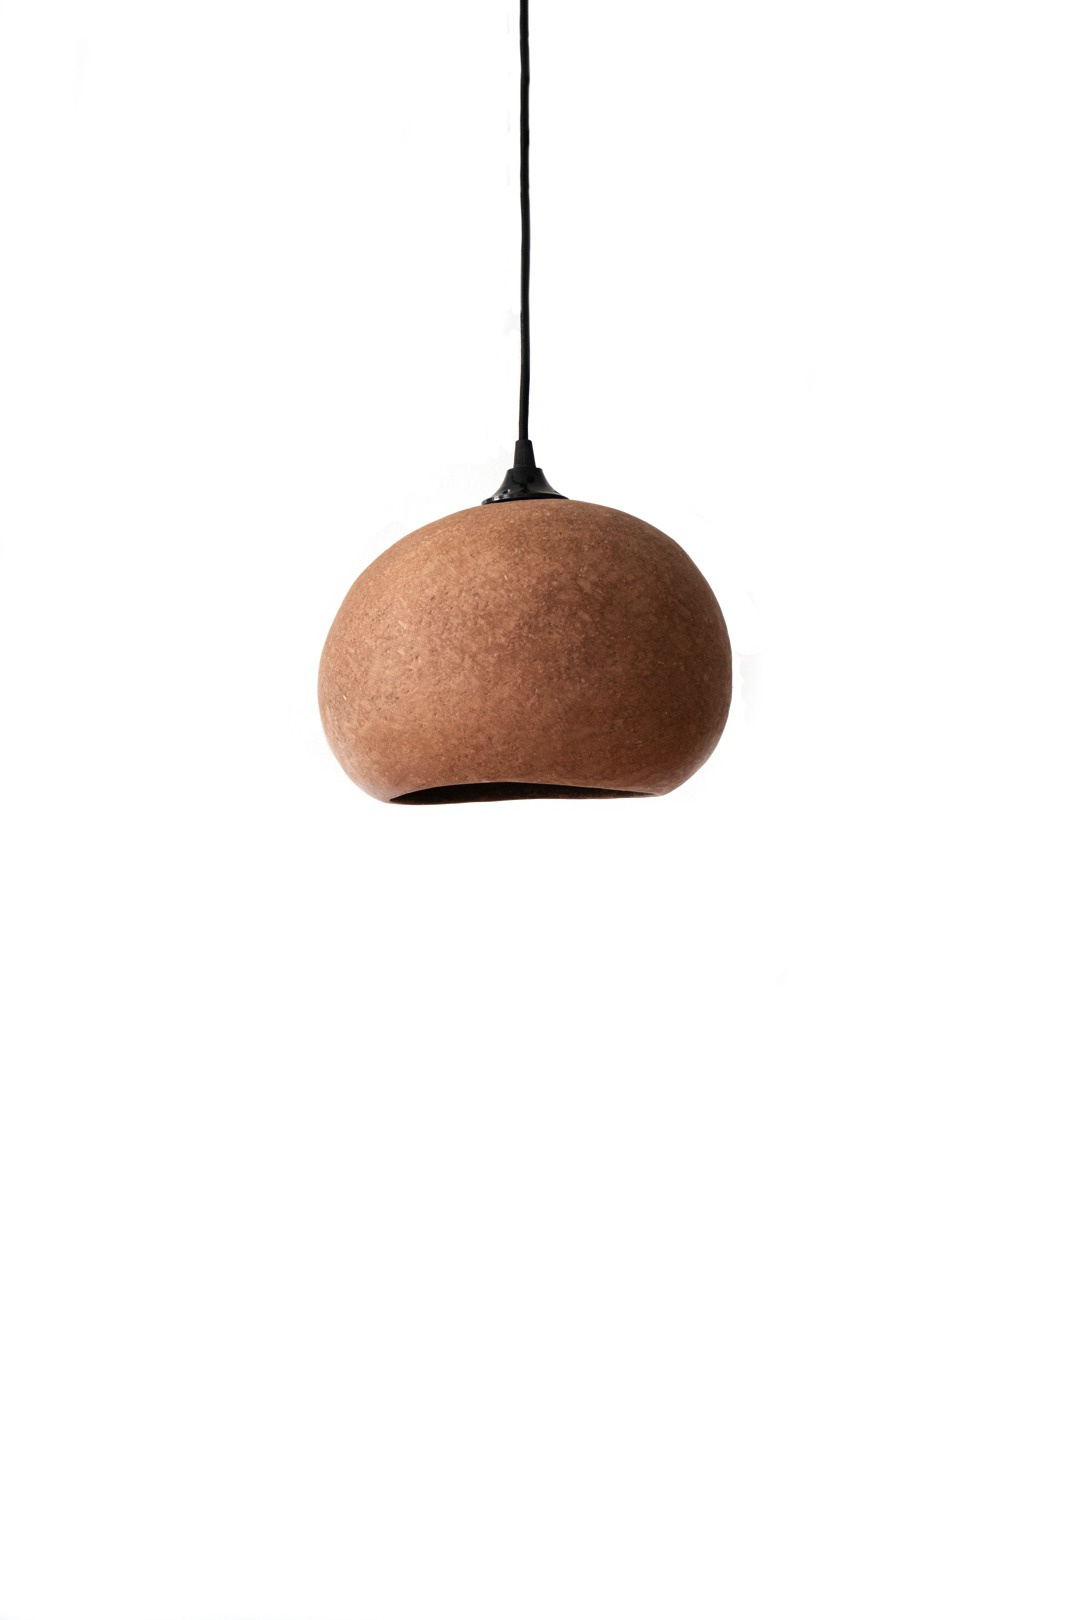 Ay Illuminate Terracotta pendant Lamp S - recycled carton - 27x21x17cm - Ay illuminate